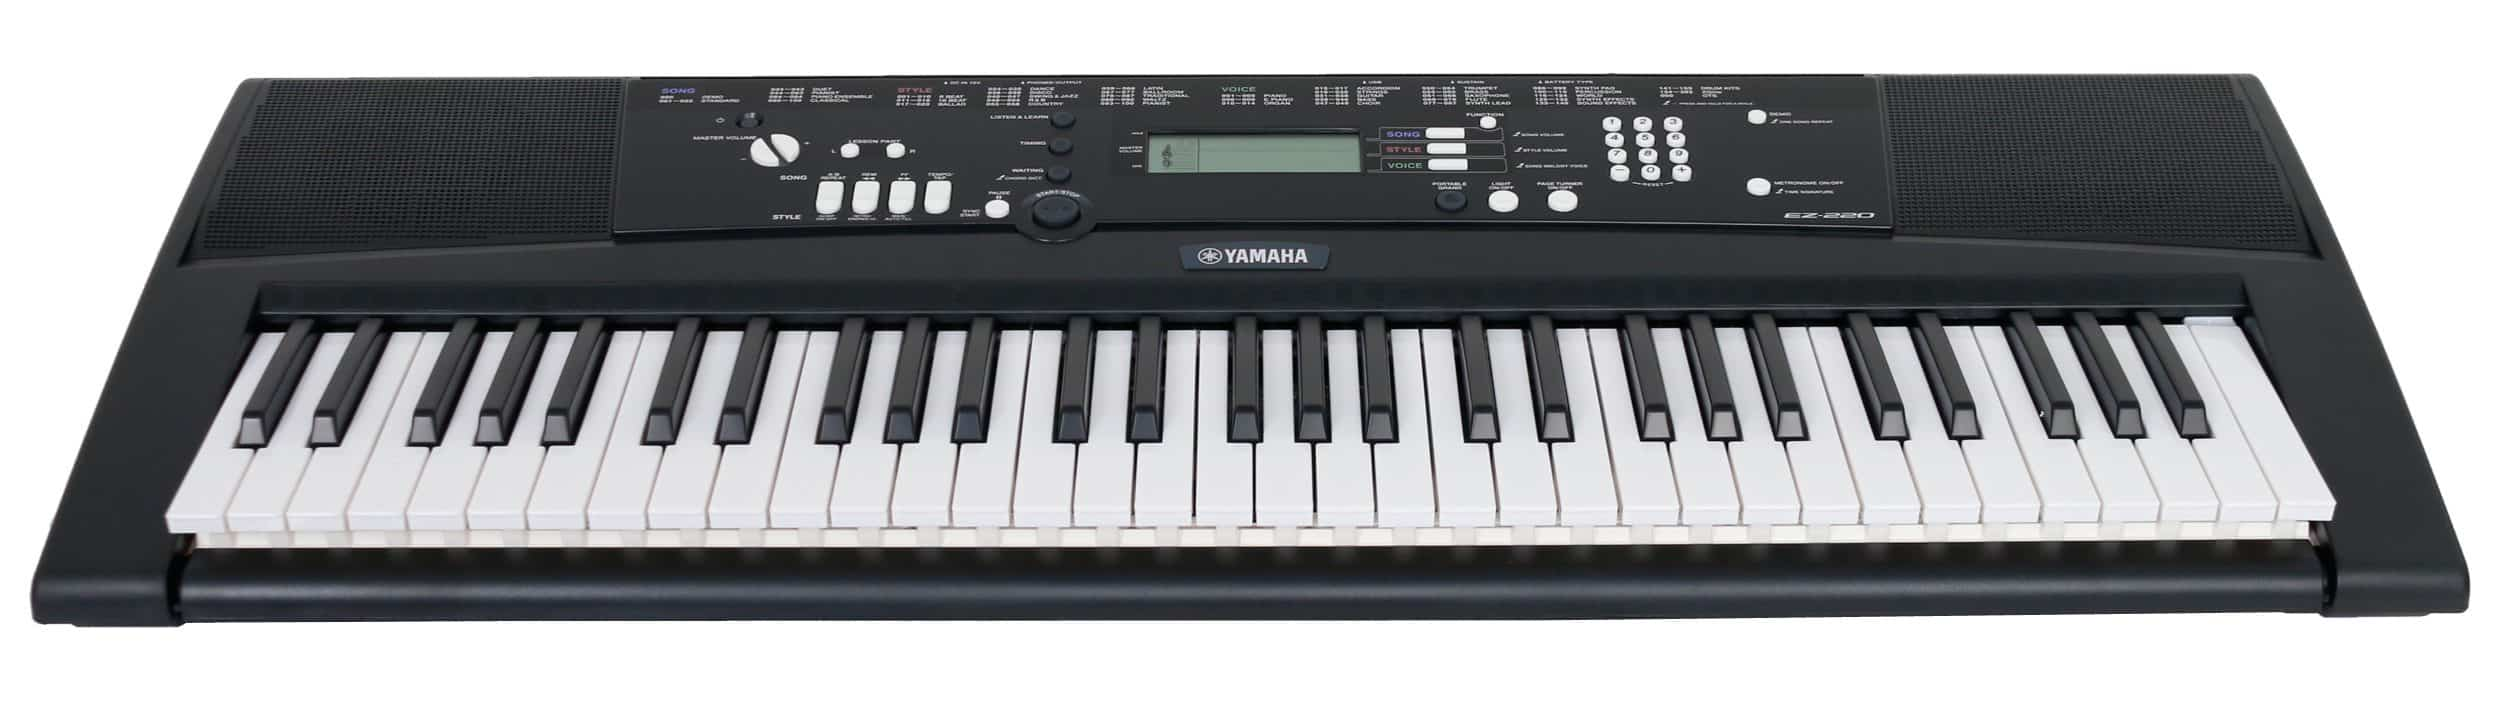 yamaha ez-220 review keyboard